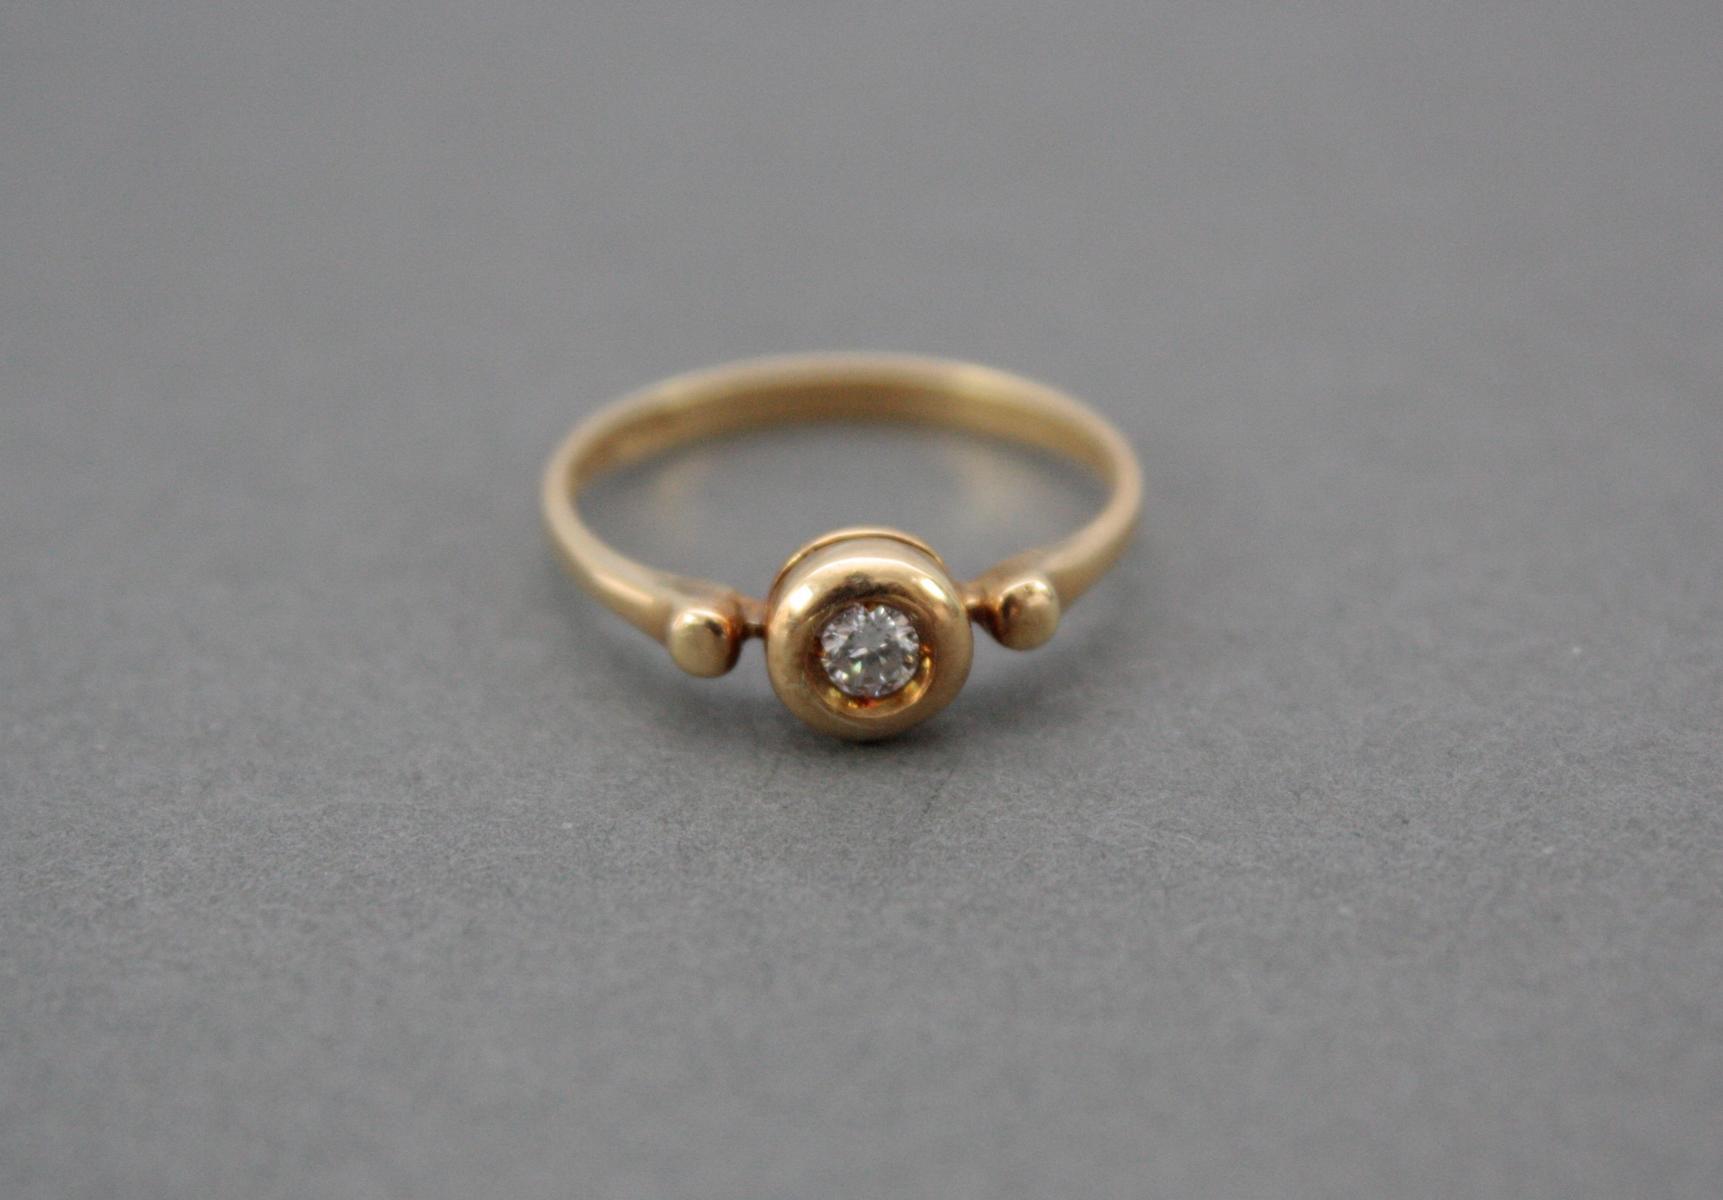 Damenring mit Diamant, 18 Karat Gelbgold